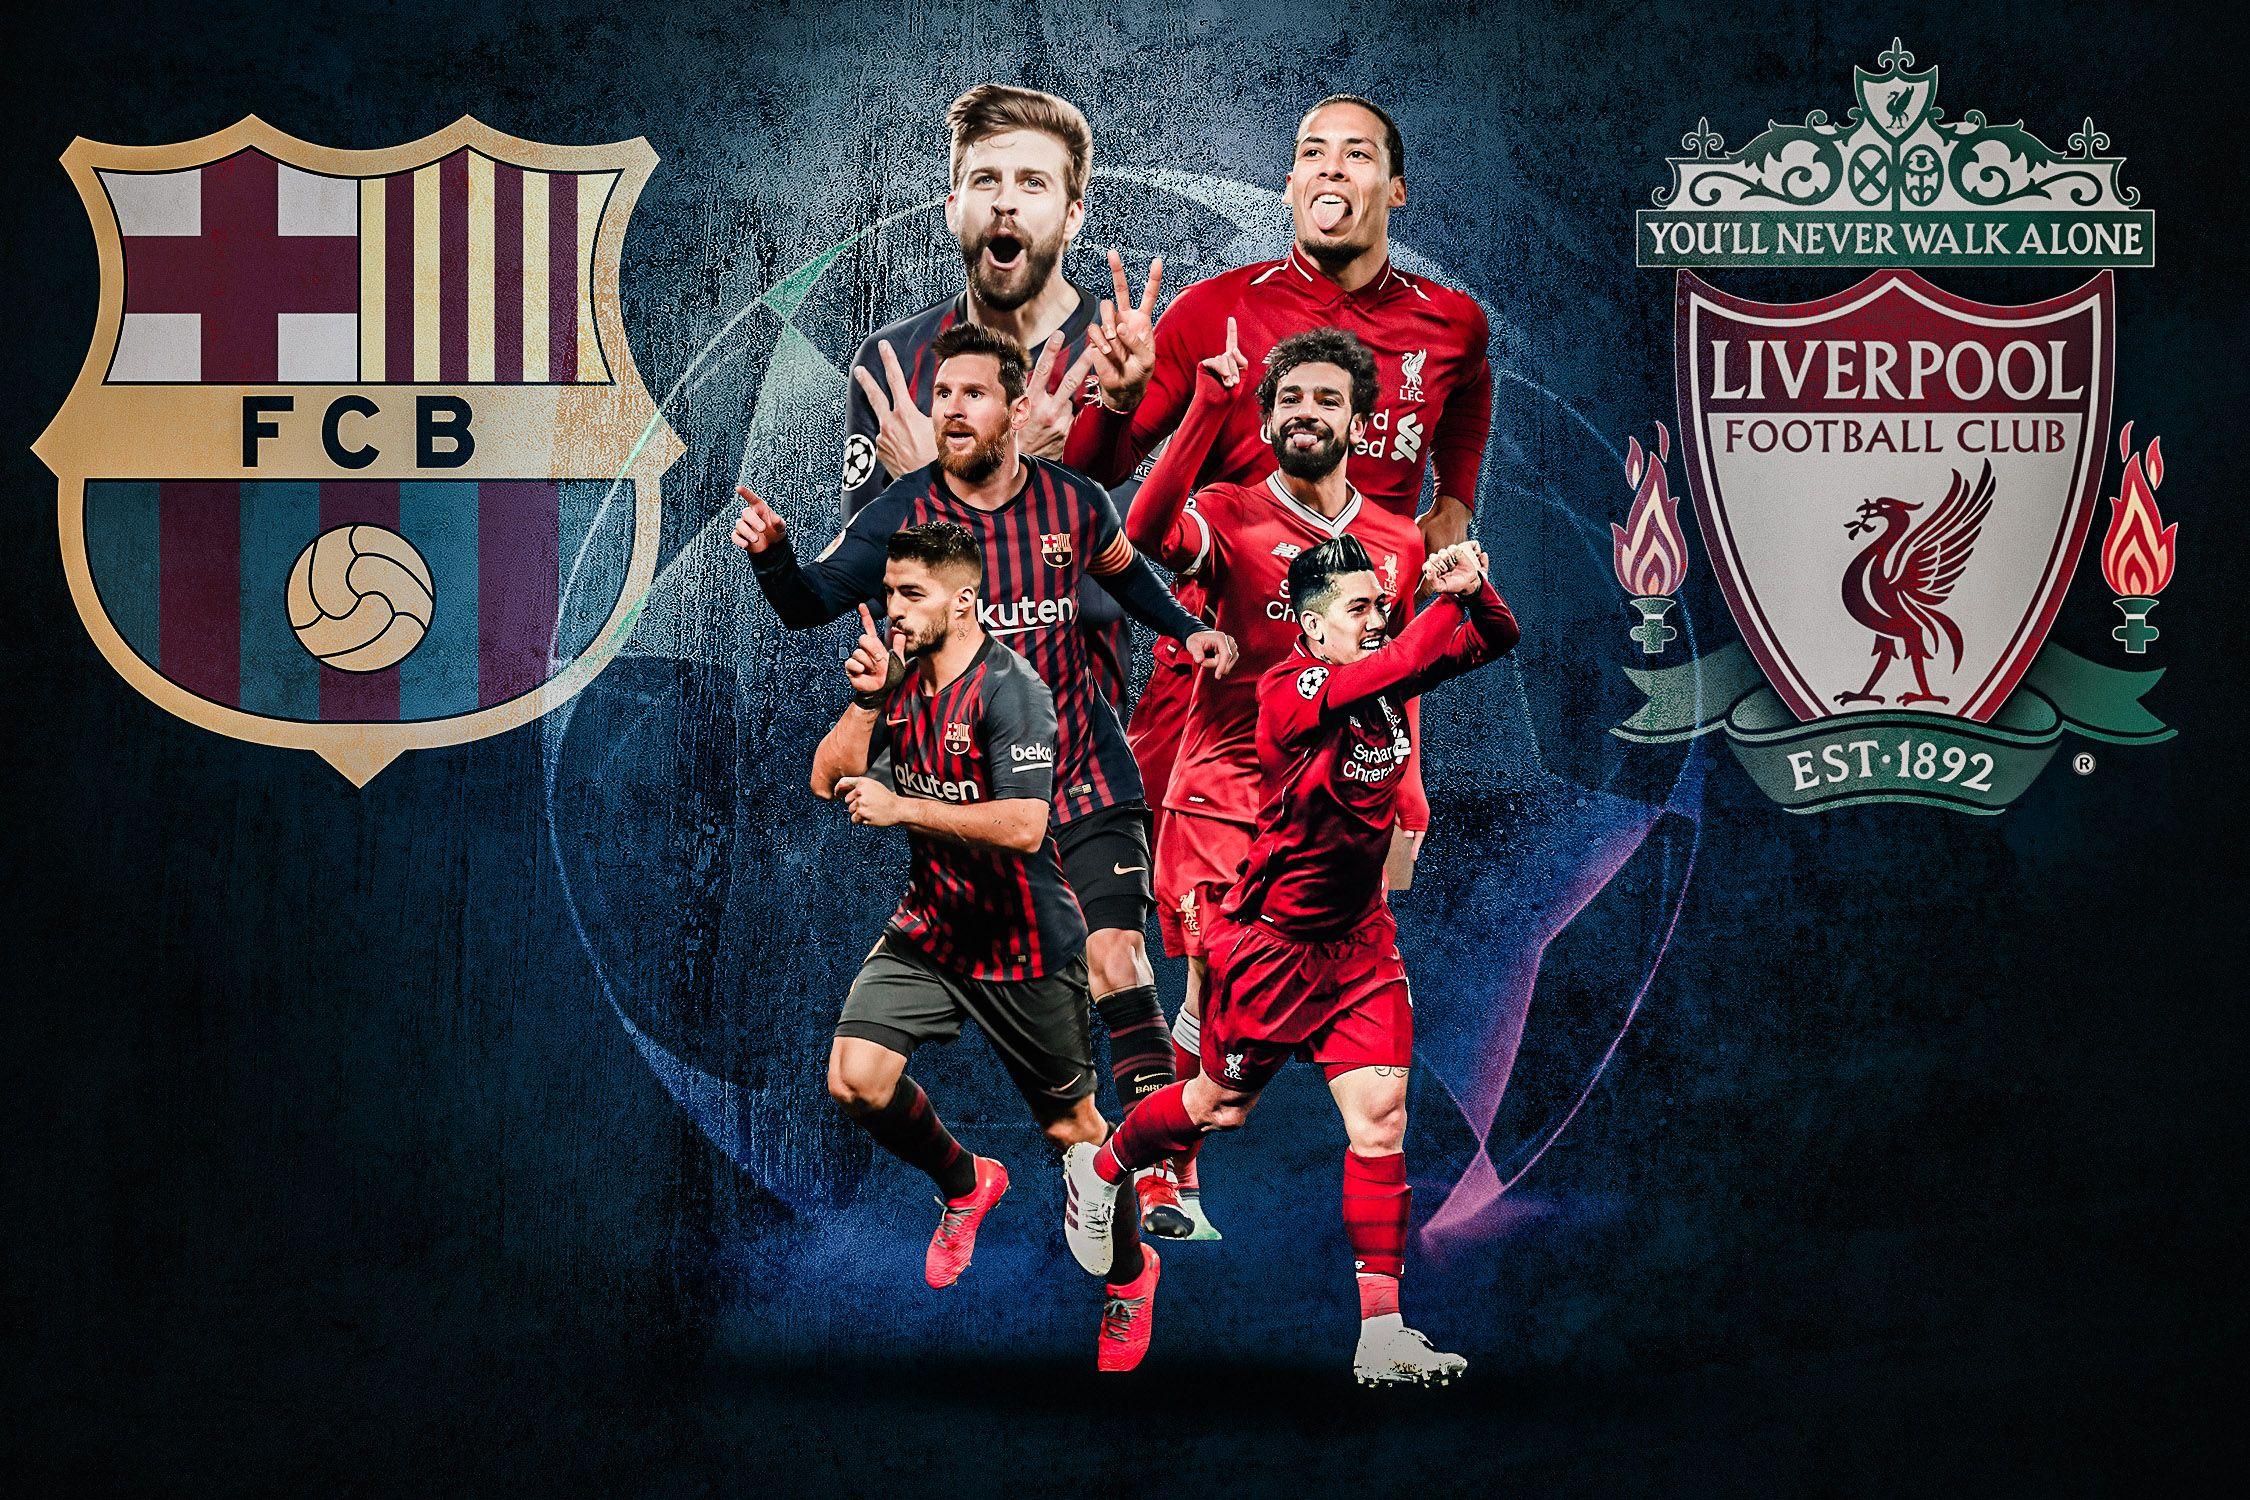 Uefa Champions League Barcelona Vs Liverpool Uefa Champions League Liverpool Uefa Champions League